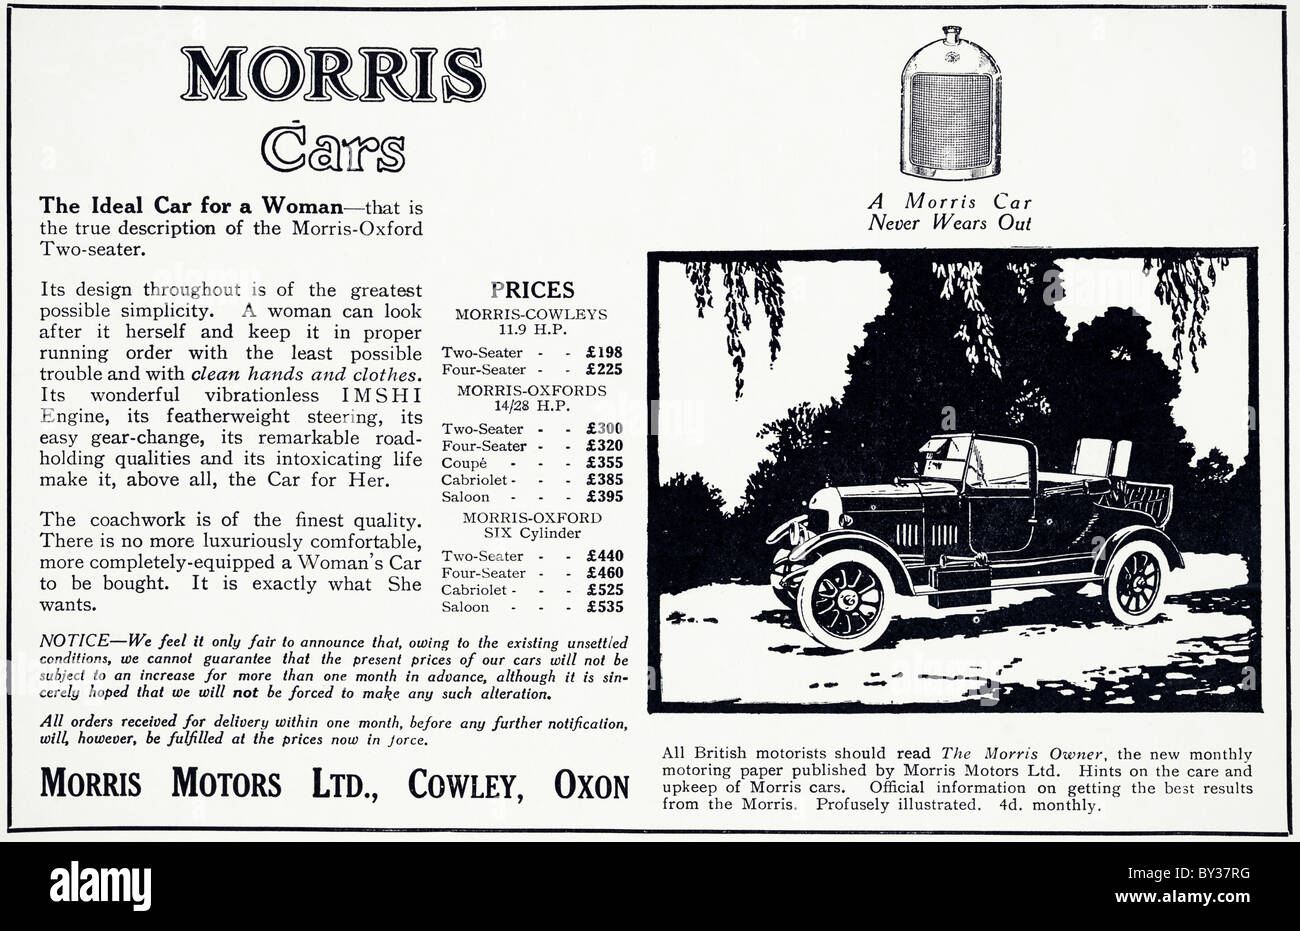 Original advert for Morris Motors Ltd 11.9 Morris-Oxford Bullnose car manufactured from 1920 to 1926 in Cowley Oxford - Stock Image